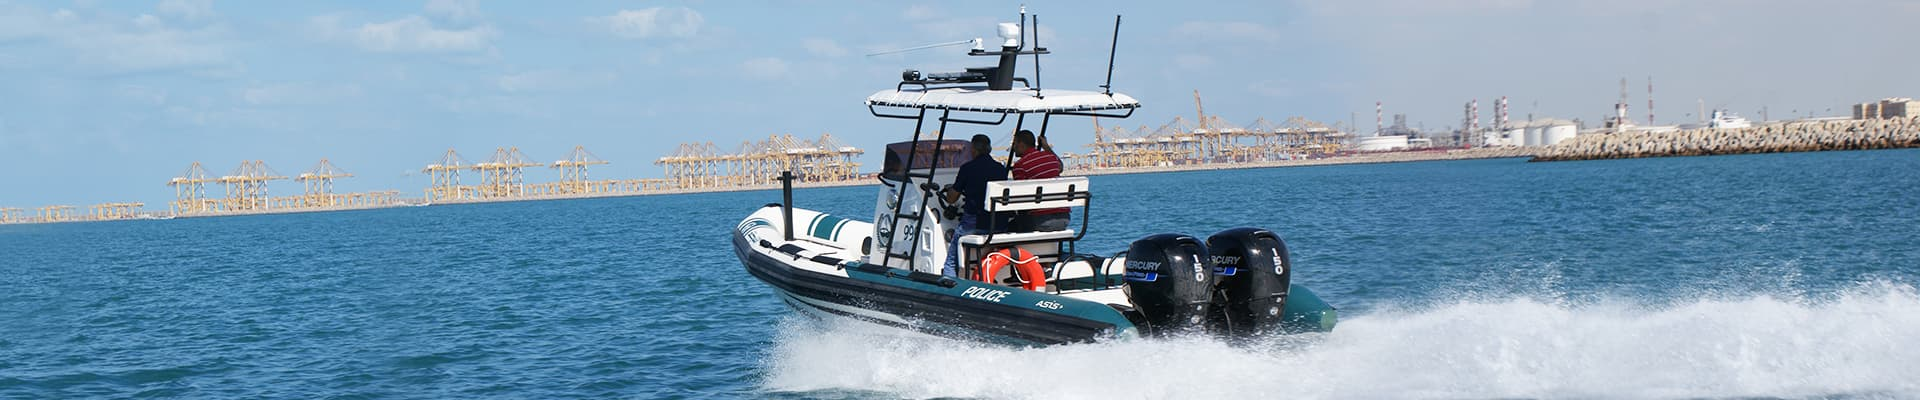 law-enforcement-rigid-inflatable-boats